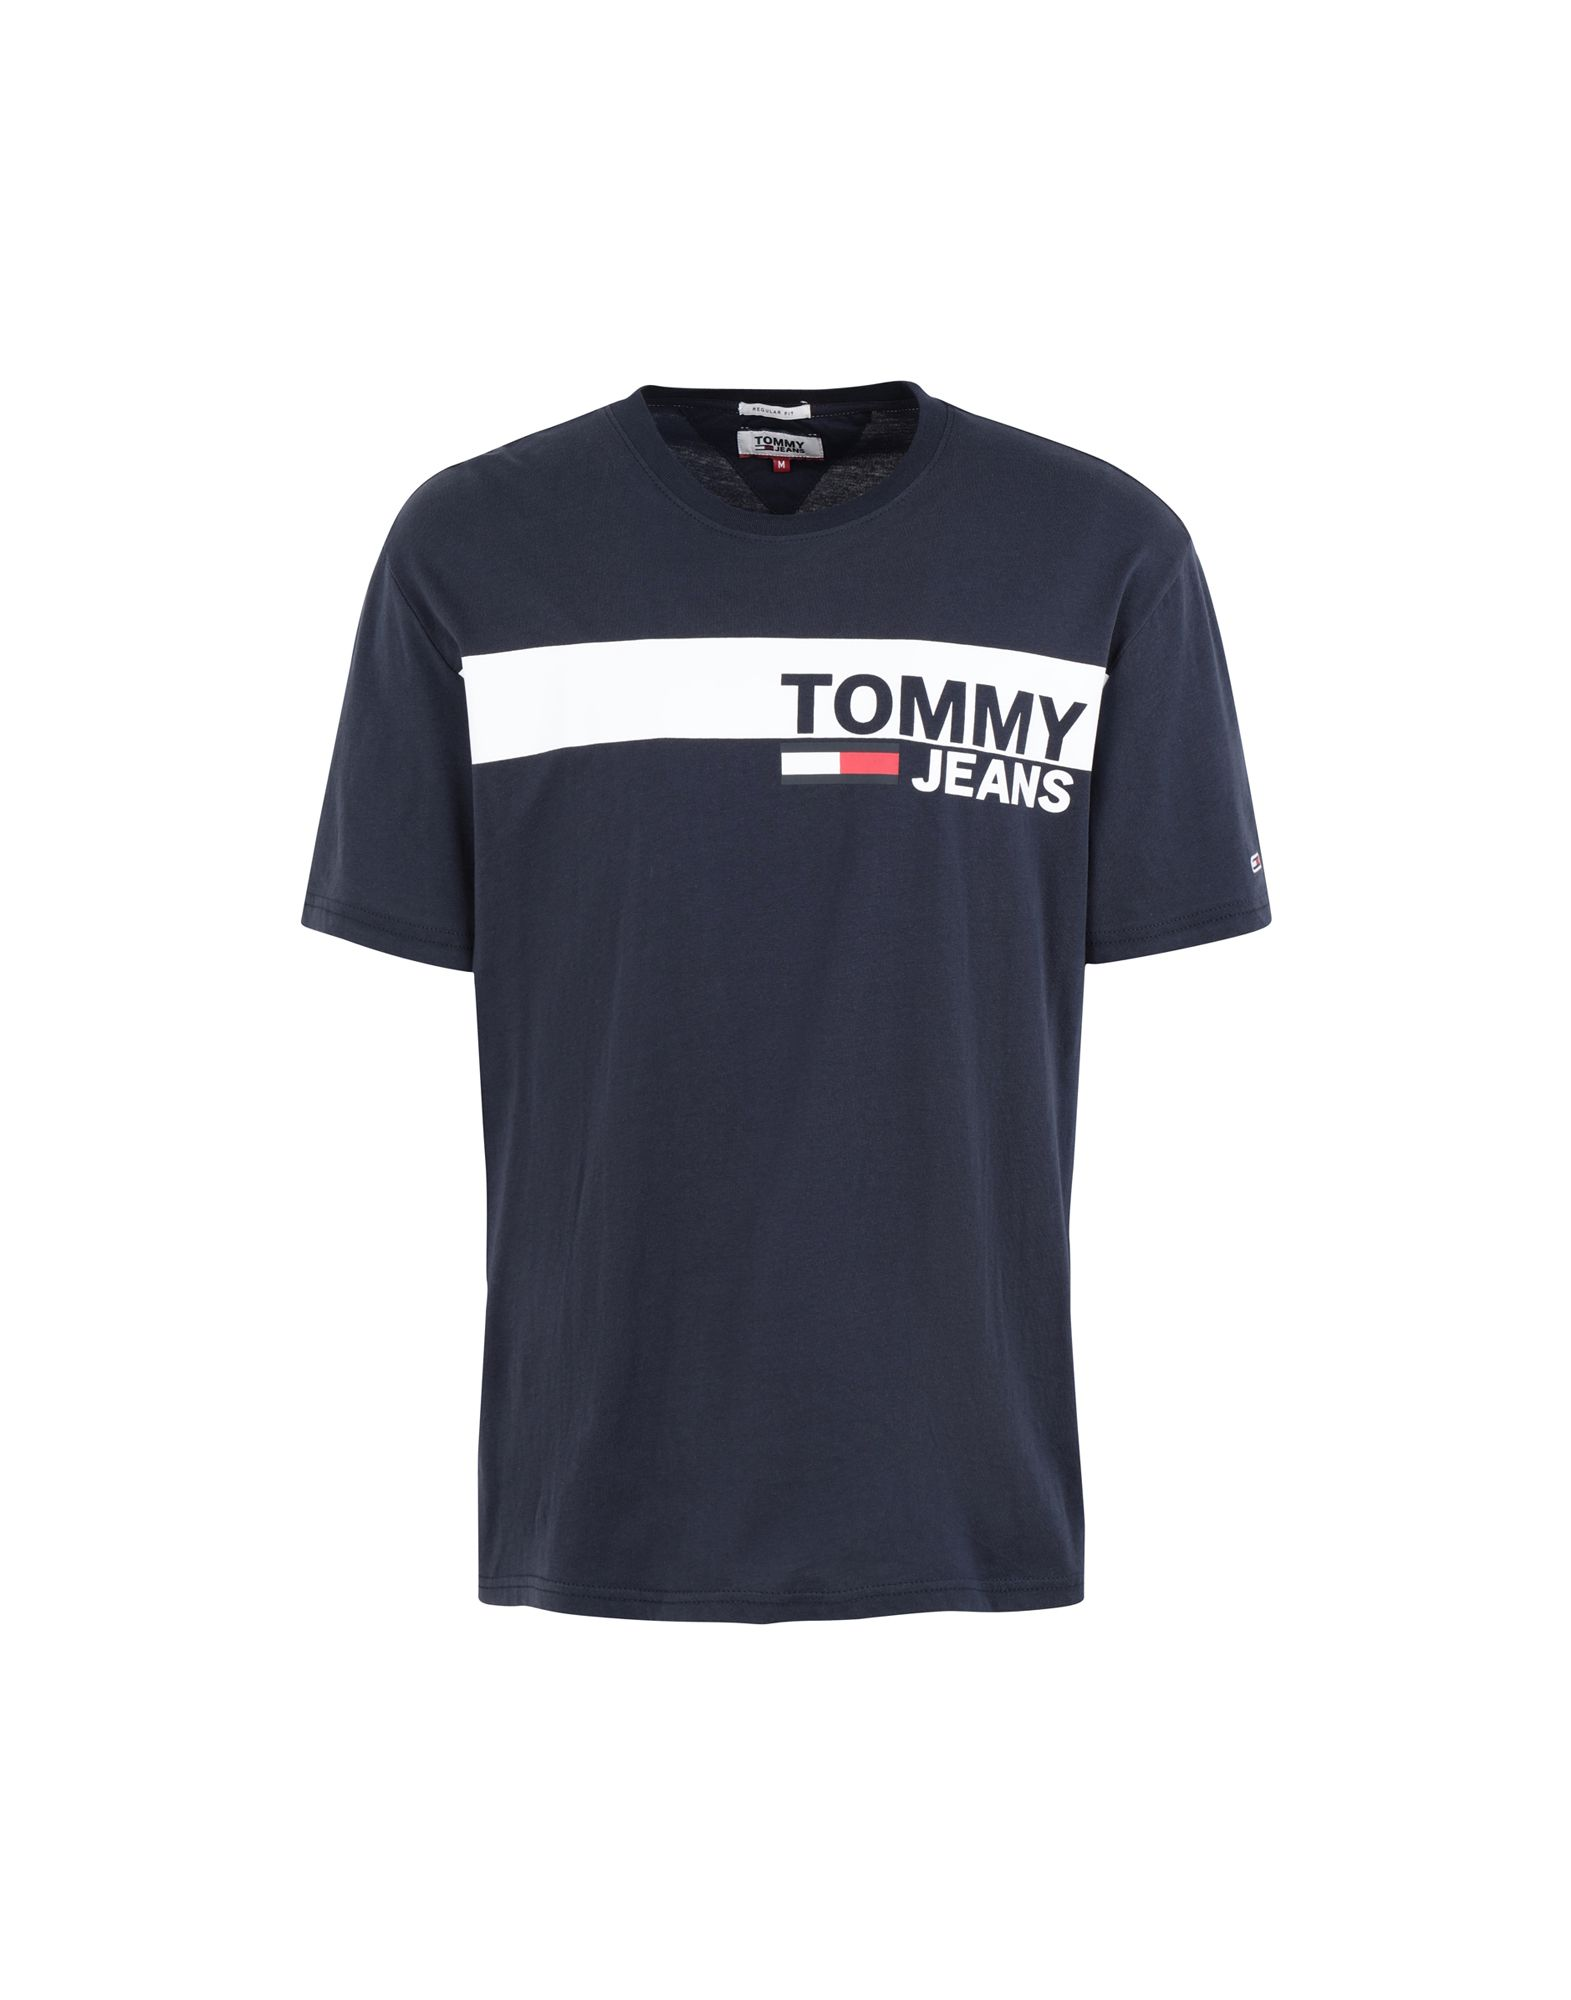 TOMMY JEANS Футболка футболка tommy jeans tommy jeans to052ewaija6